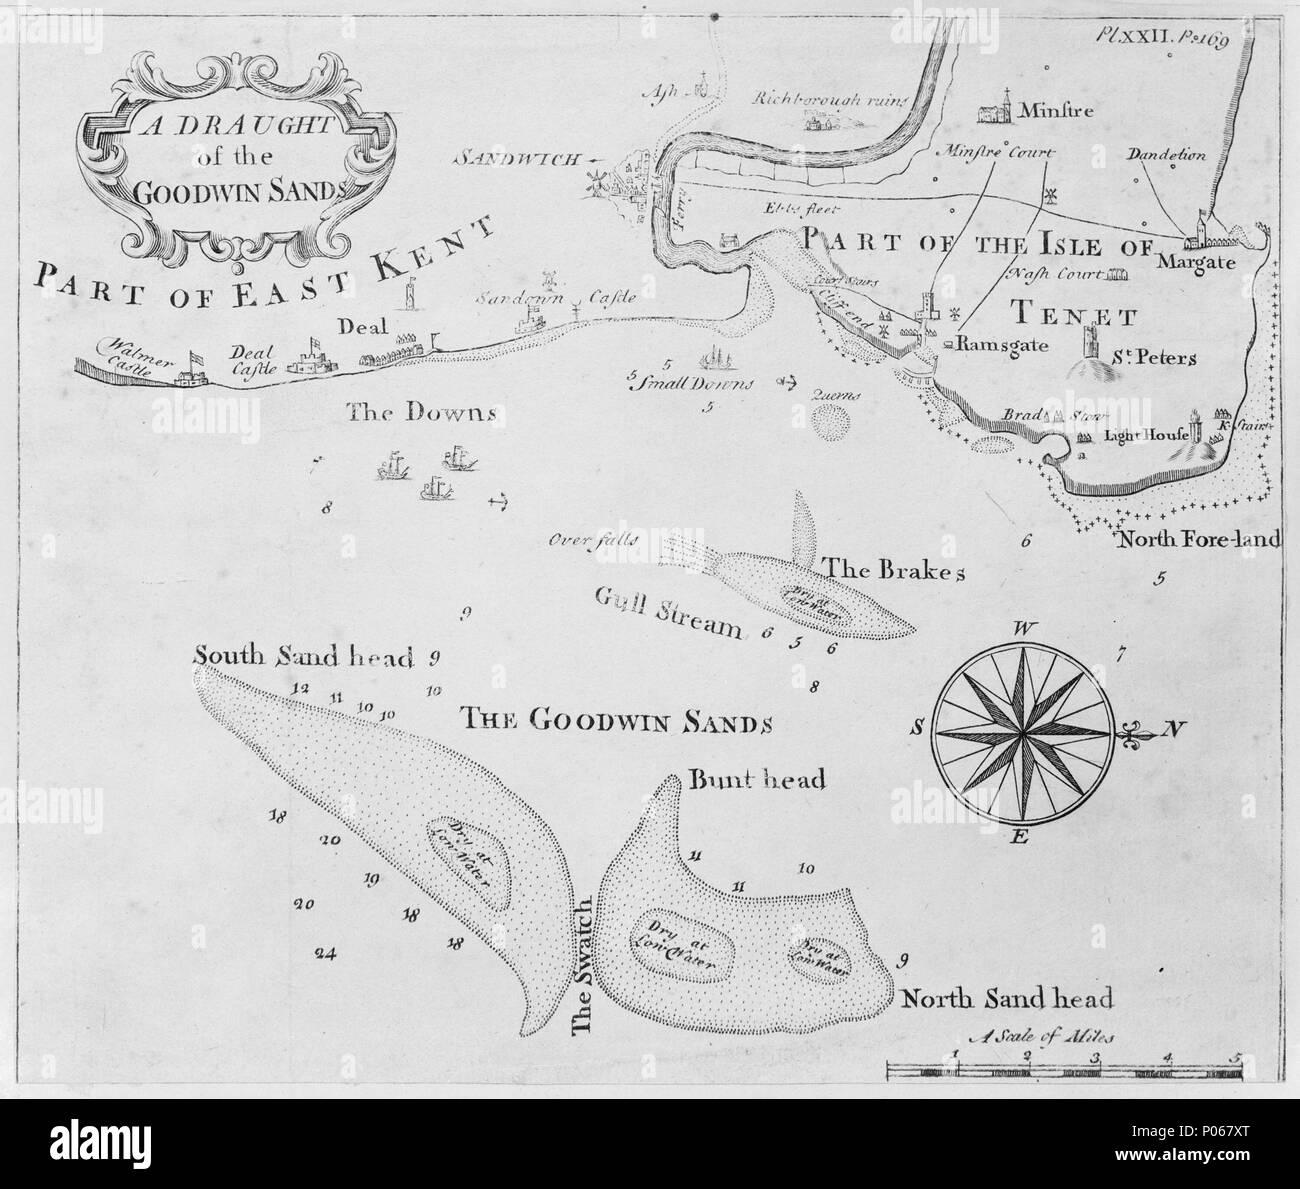 Englisch Einen Entwurf Der Goodwin Sands Pl Xxii P169 Maßstab 1